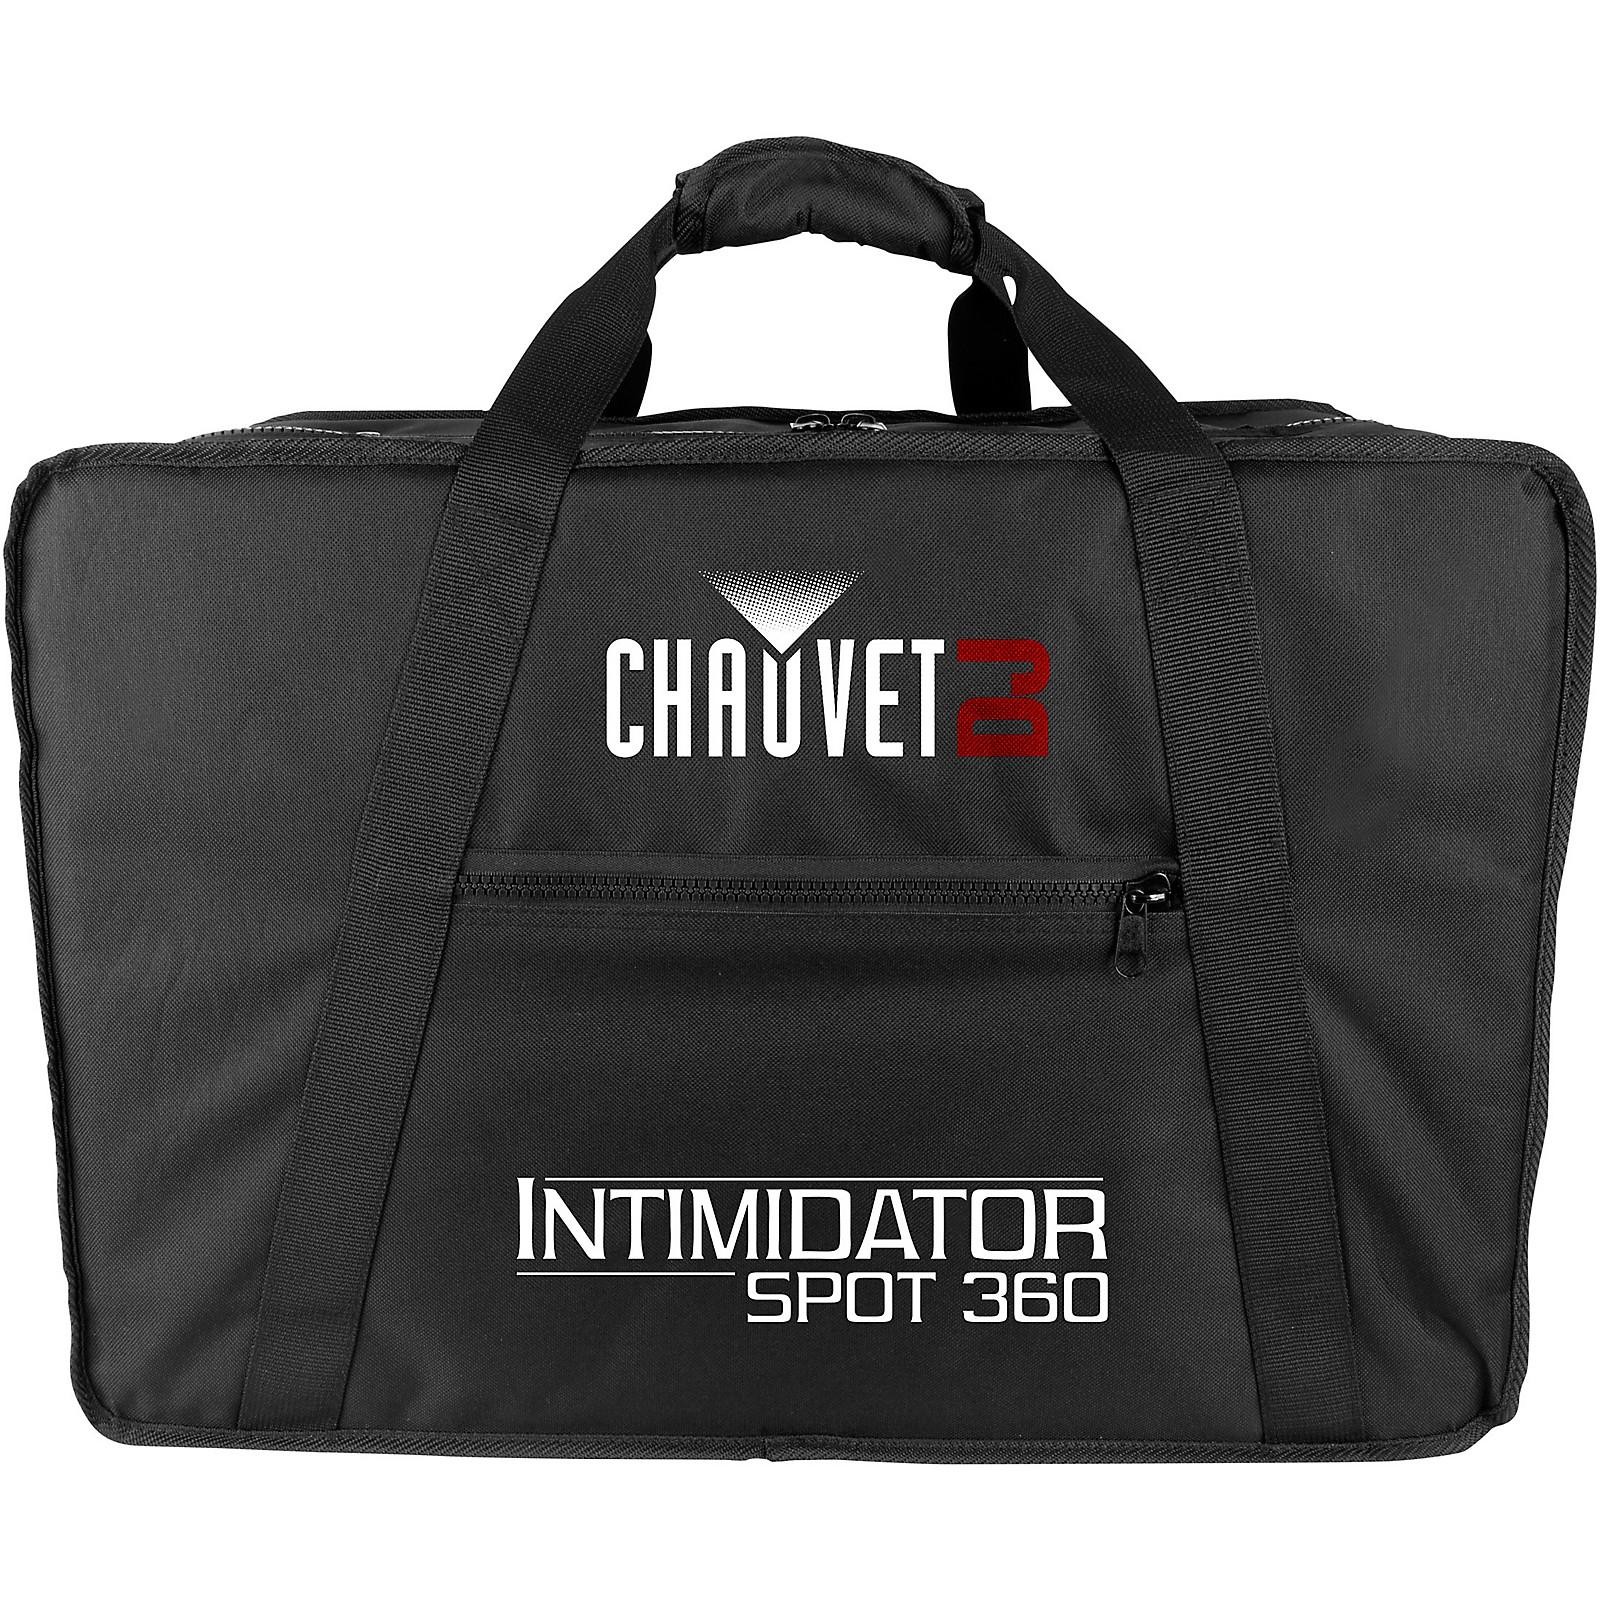 CHAUVET DJ CHS-360 Case for Intimidator Spot 360